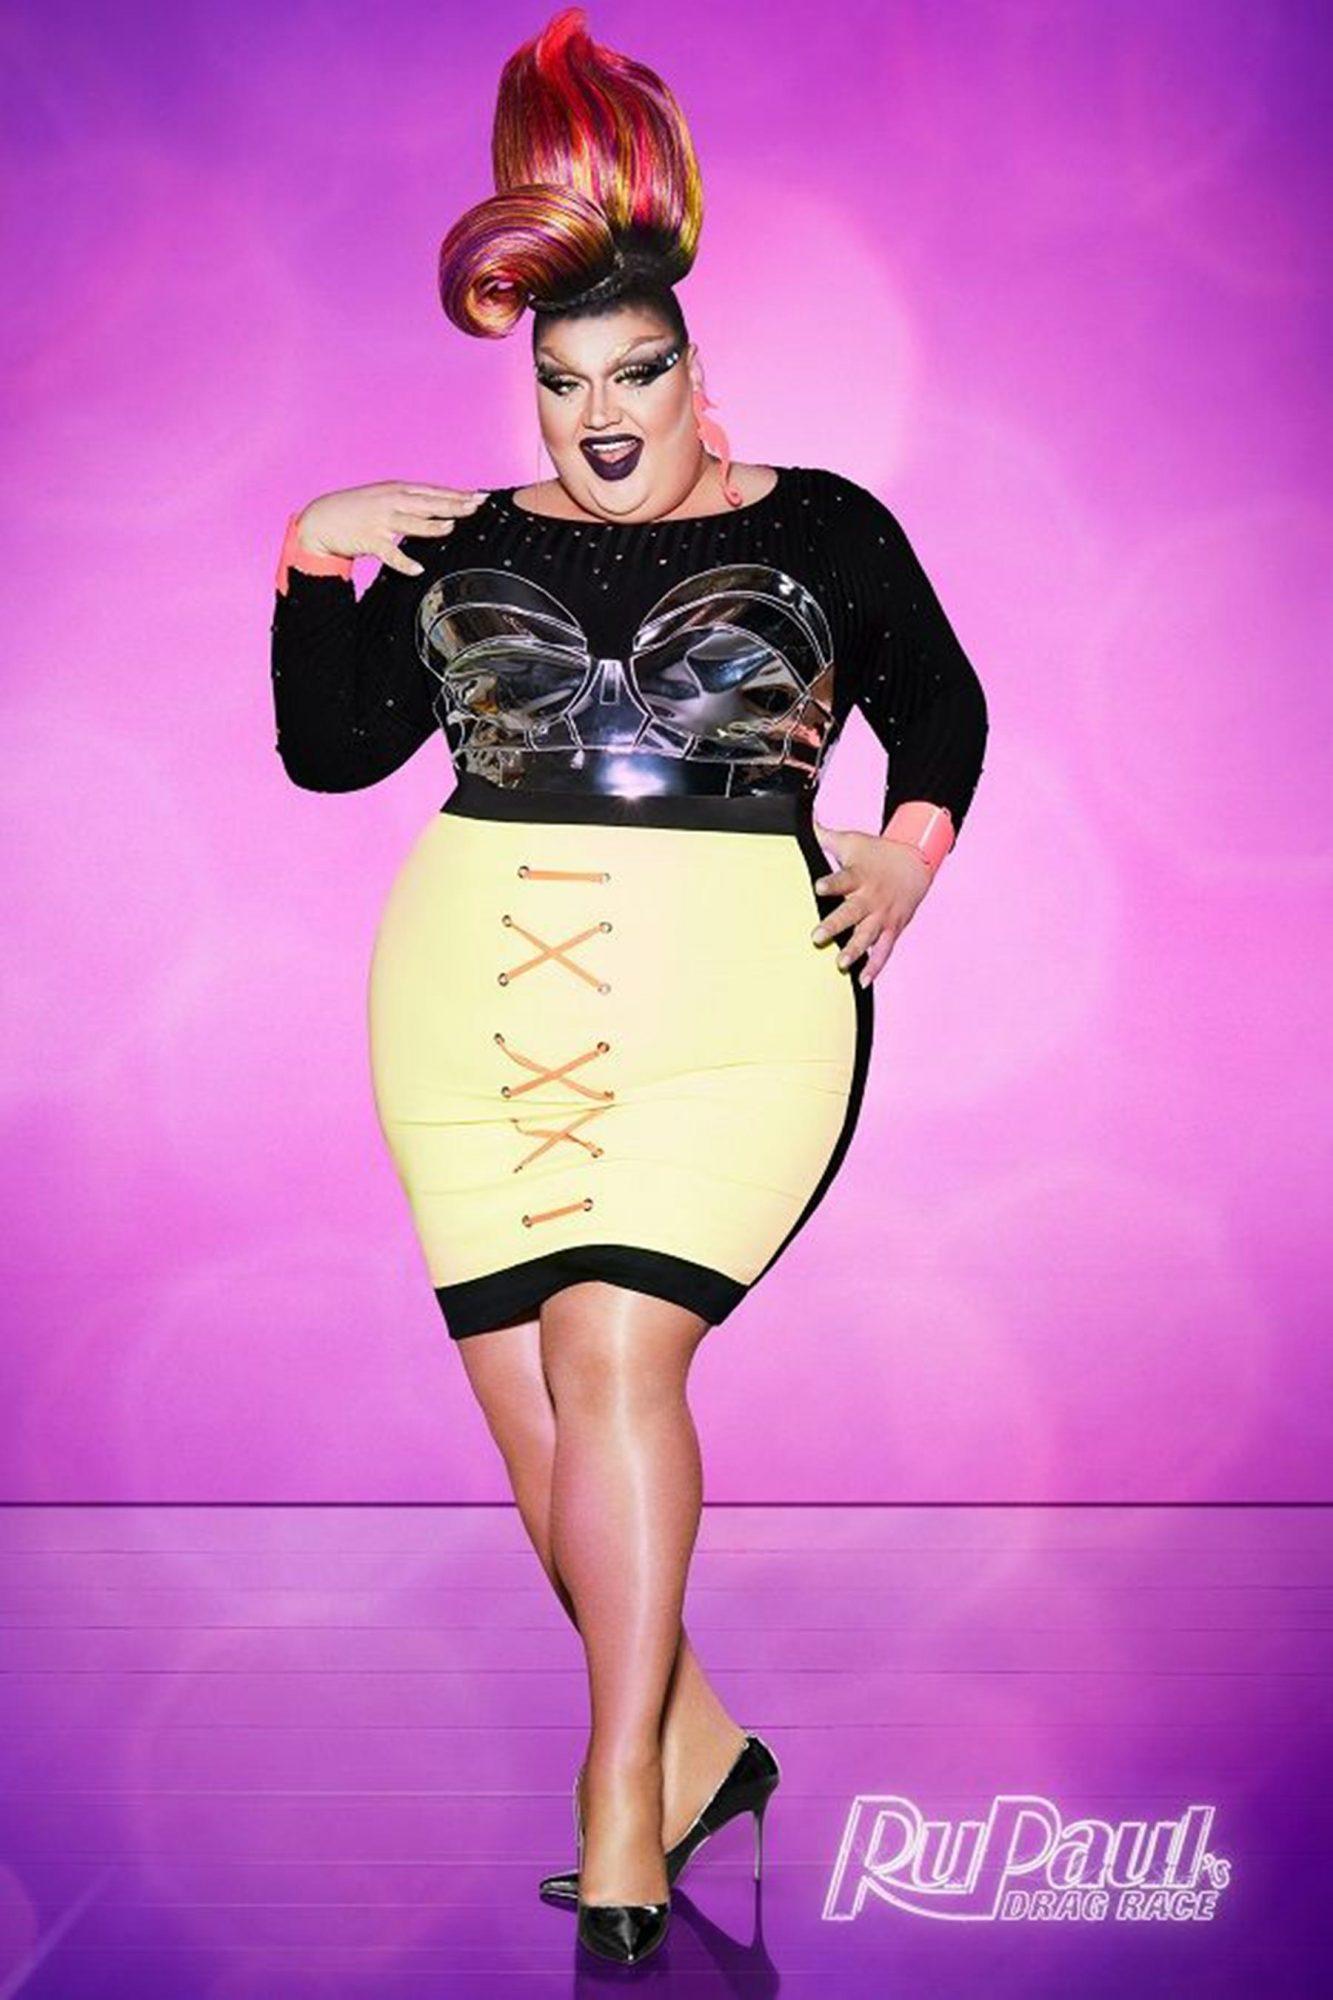 RuPaul Drag Race -- Pictured: EUREKA CR: VH1